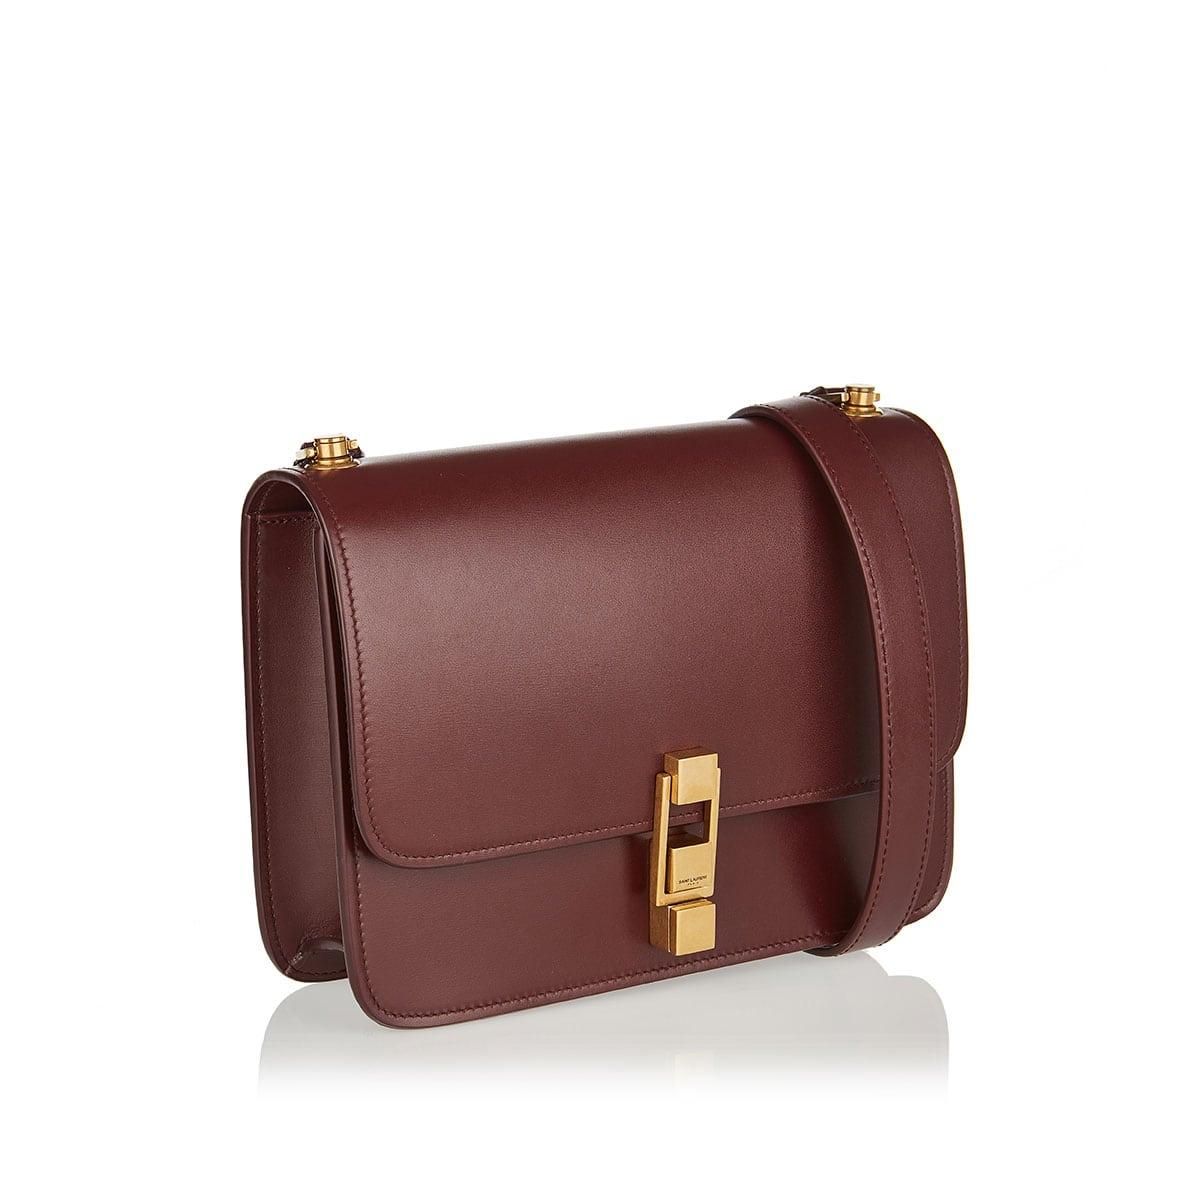 Carre leather satchel bag